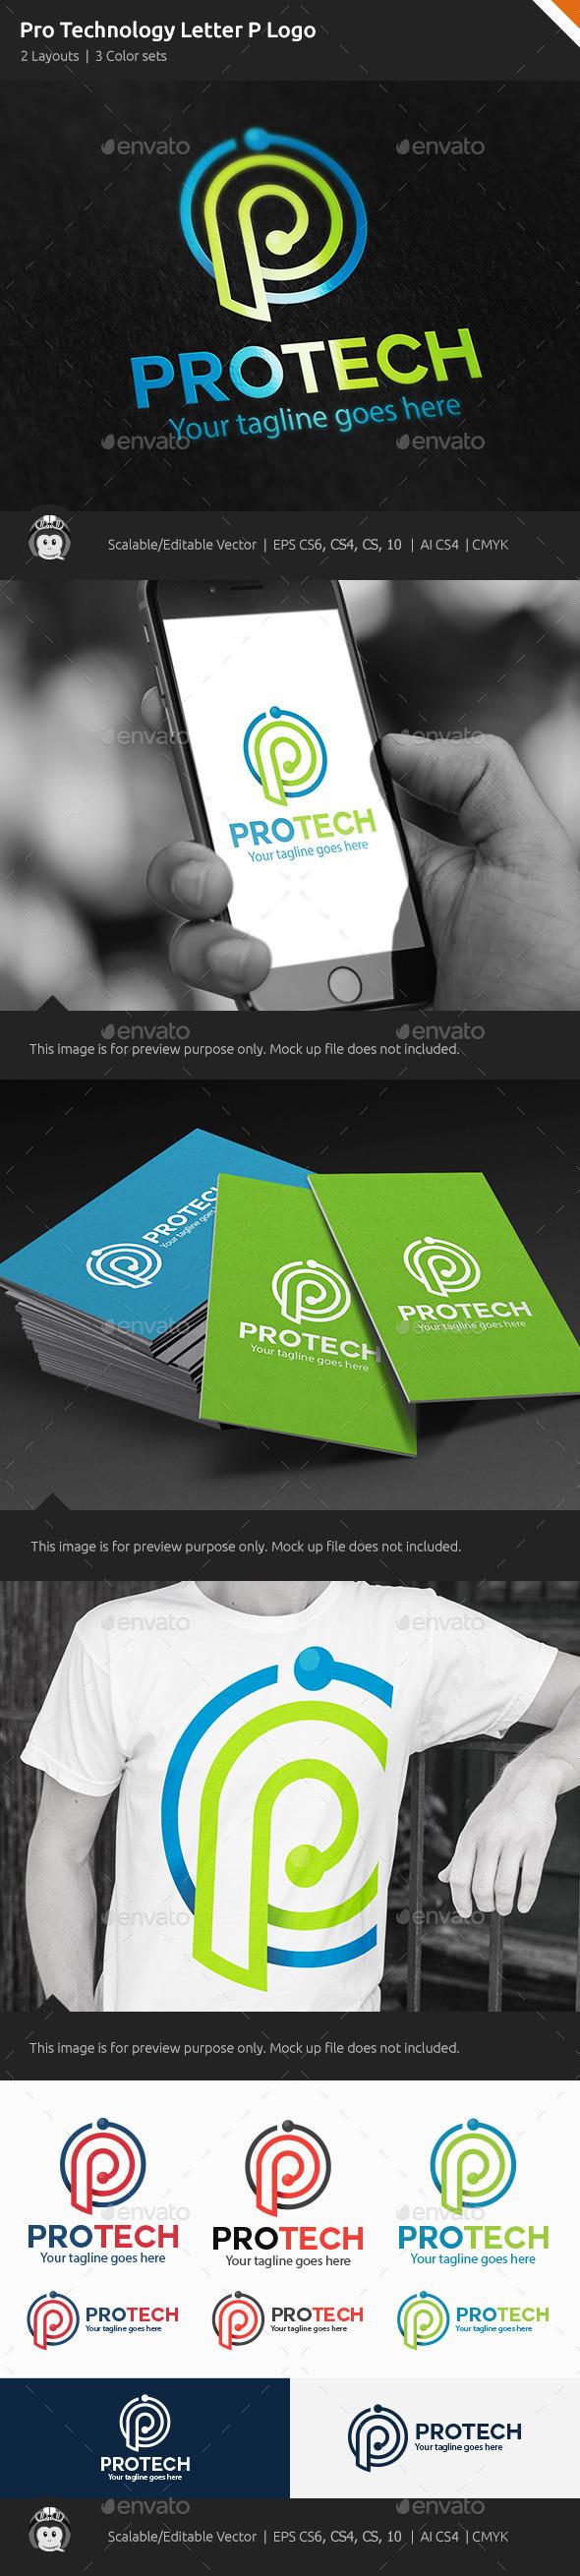 Pro Technology Letter P Logo - Letters Logo Templates